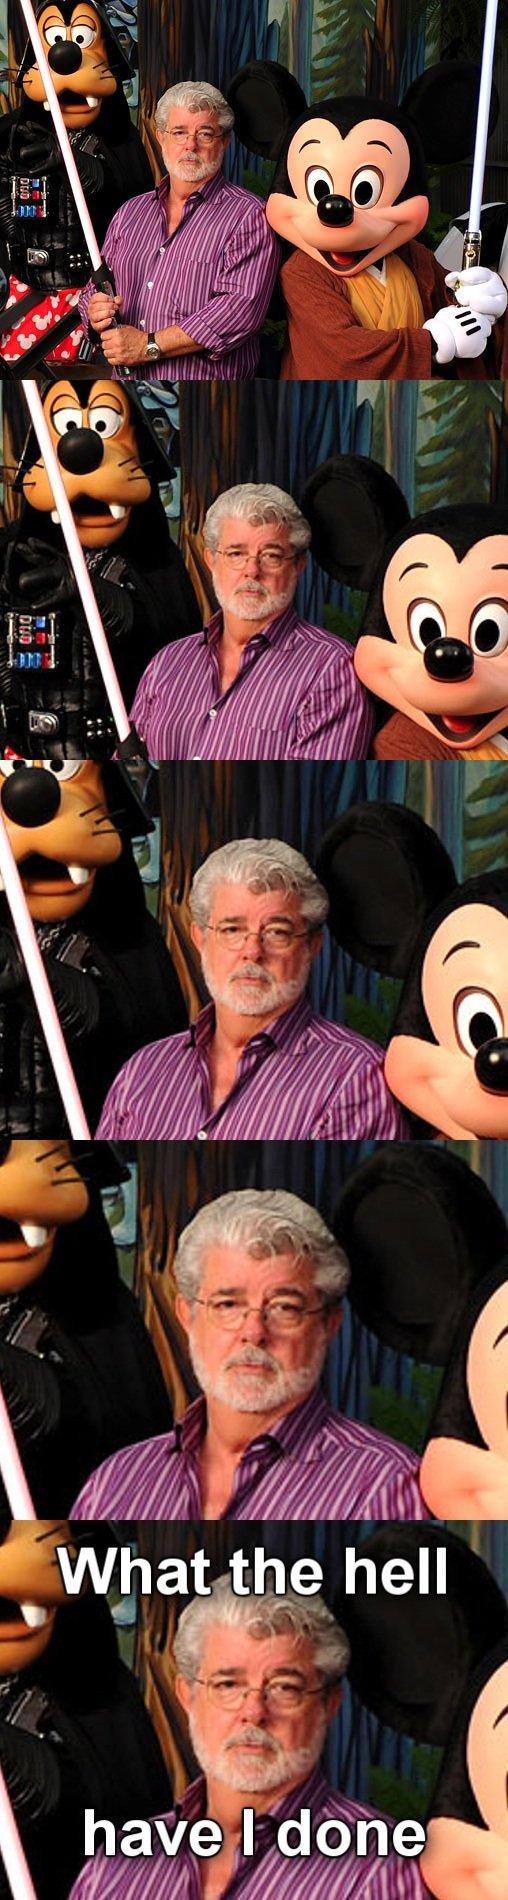 Disney. . iai, t,? hell. I just realized... Since Disney owns Starwars and Disney owns Disneyland... STAR WARS ROLLERCOASTER! YEAH!